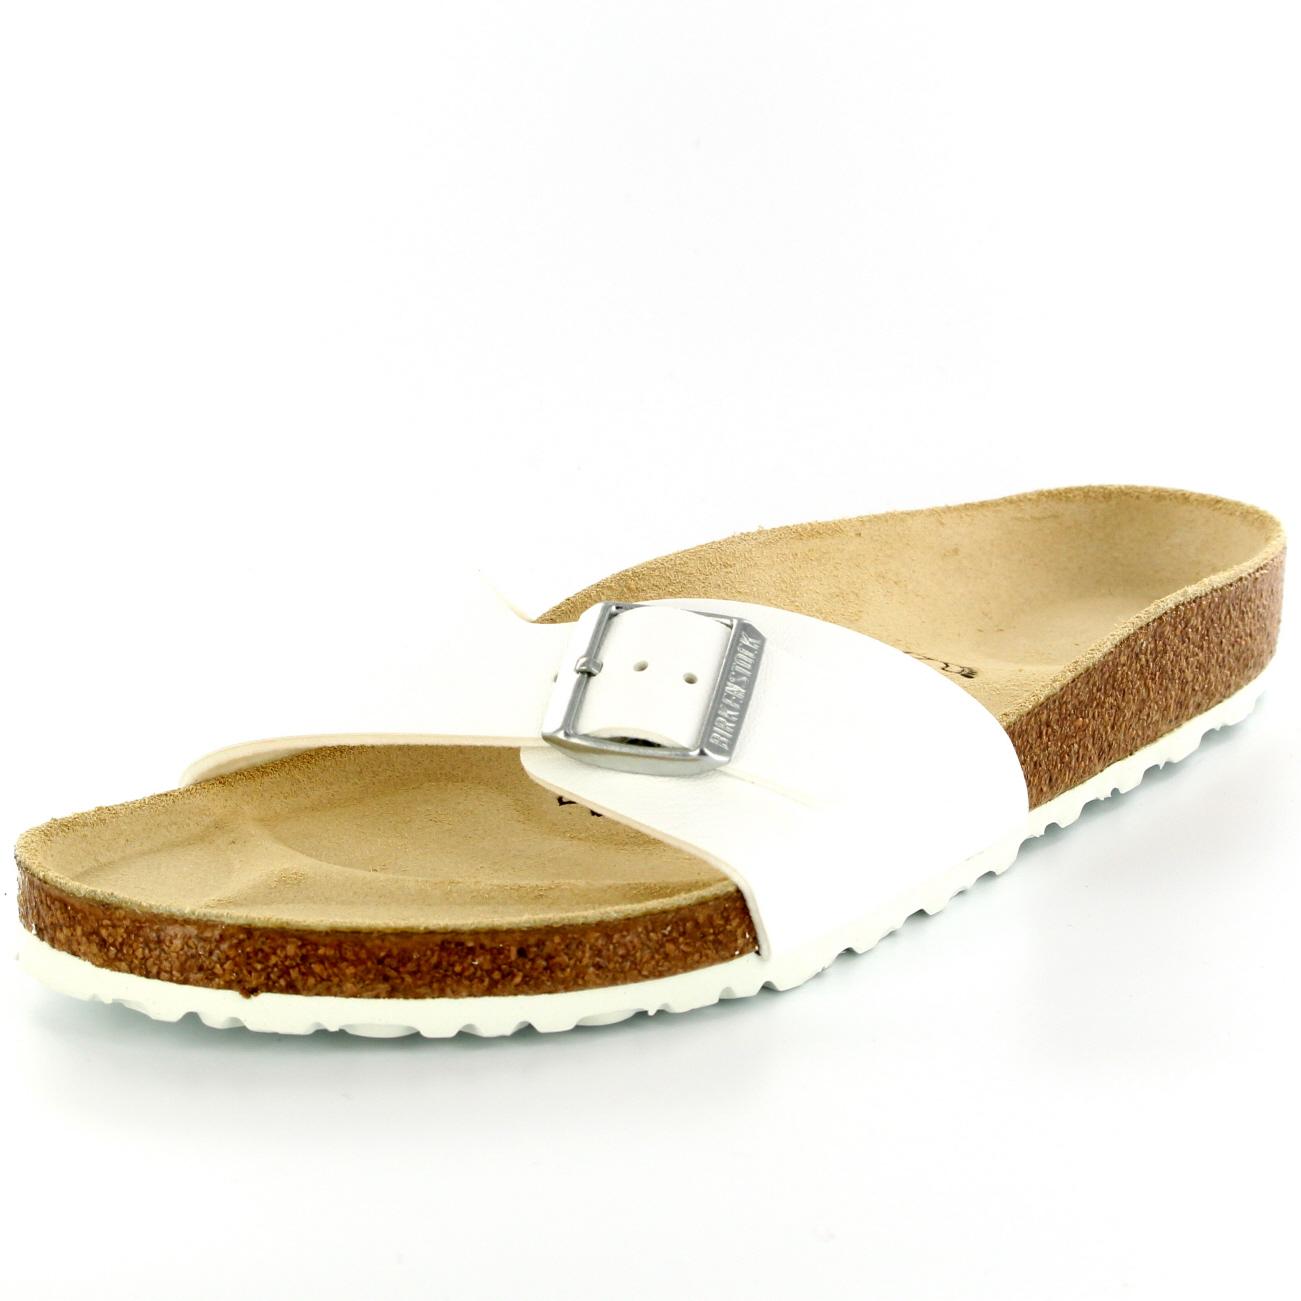 Unisex-Adults-Birkenstock-Madrid-Casual-Birko-Flor-Beach-Summer-Sandals-UK-2-13 thumbnail 16